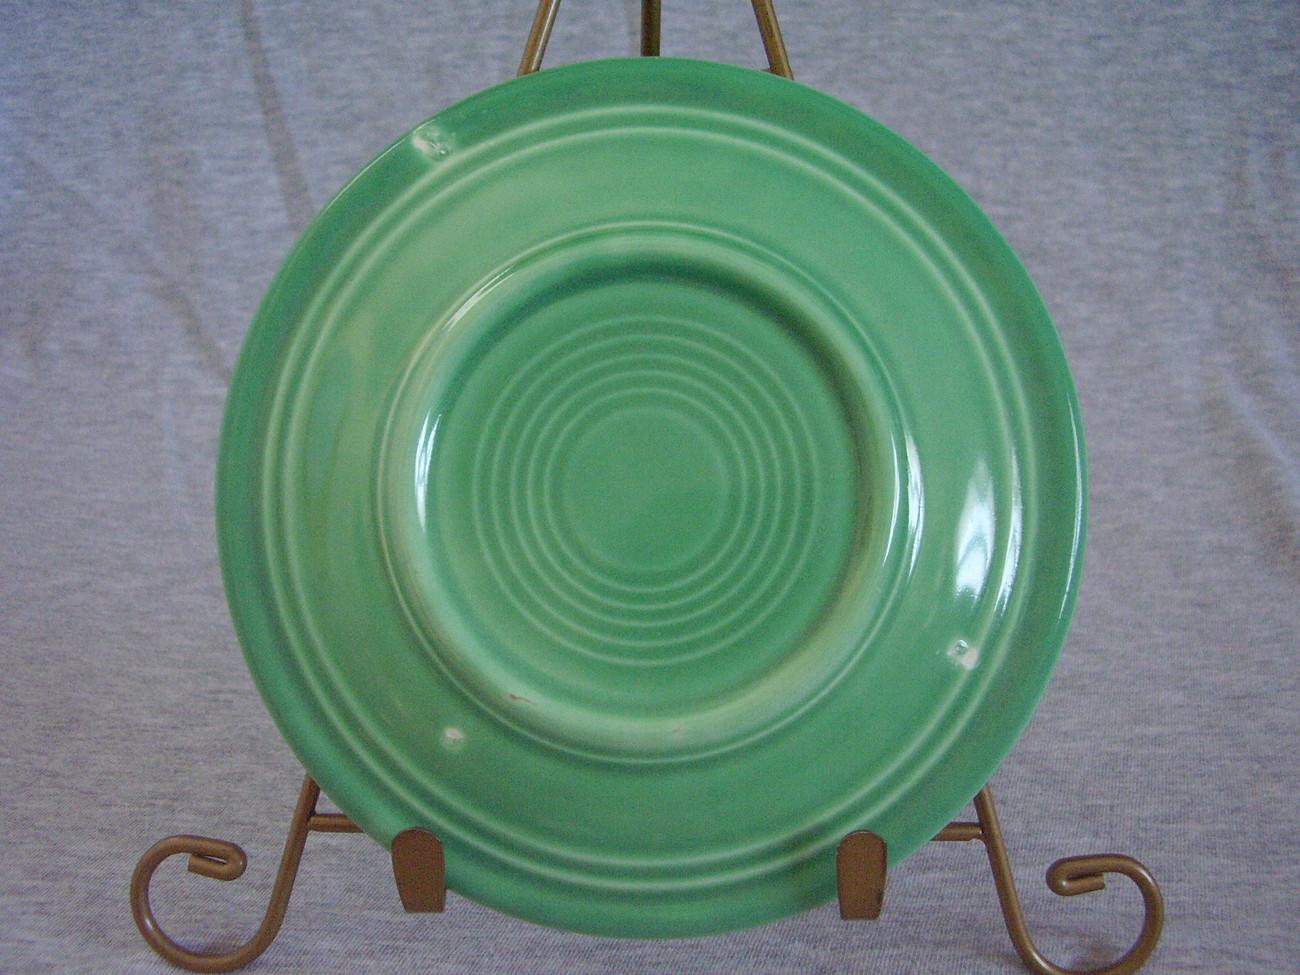 Vintage Fiestaware Original Green Bread Butter Plate  E